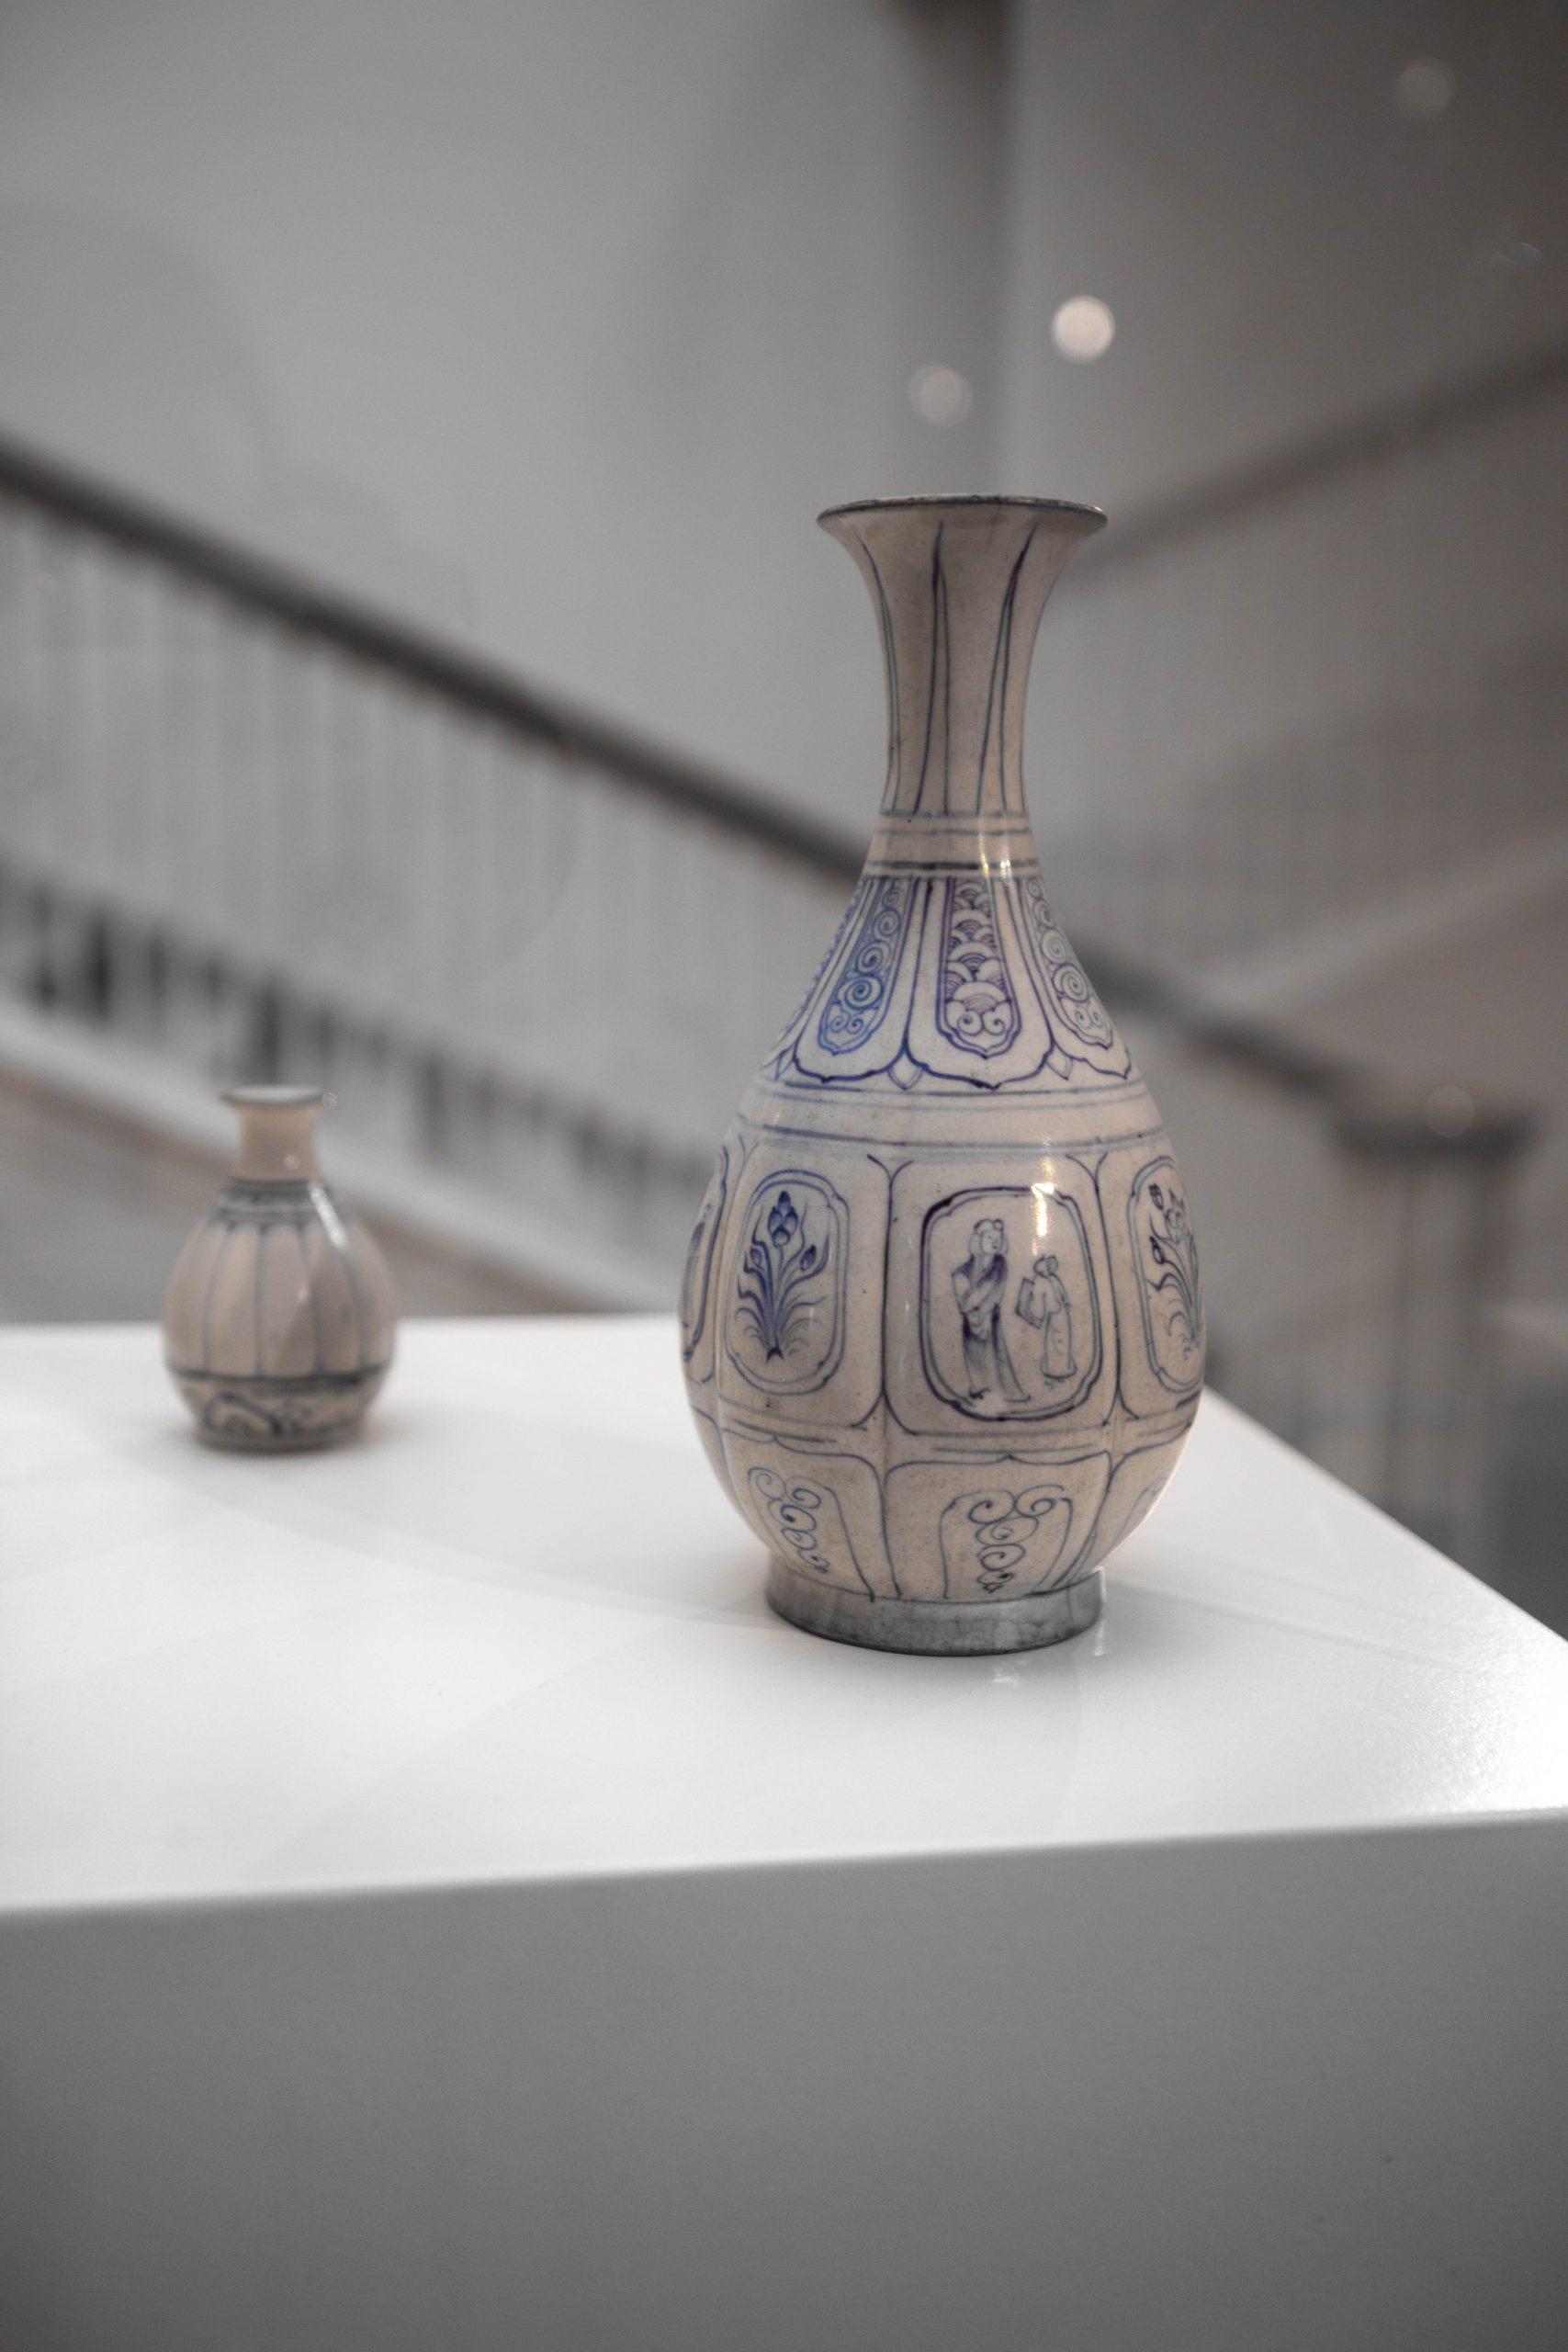 Ming Vase The Art Institute of Chicago in Chicago, Illinois by Annie Fairfax